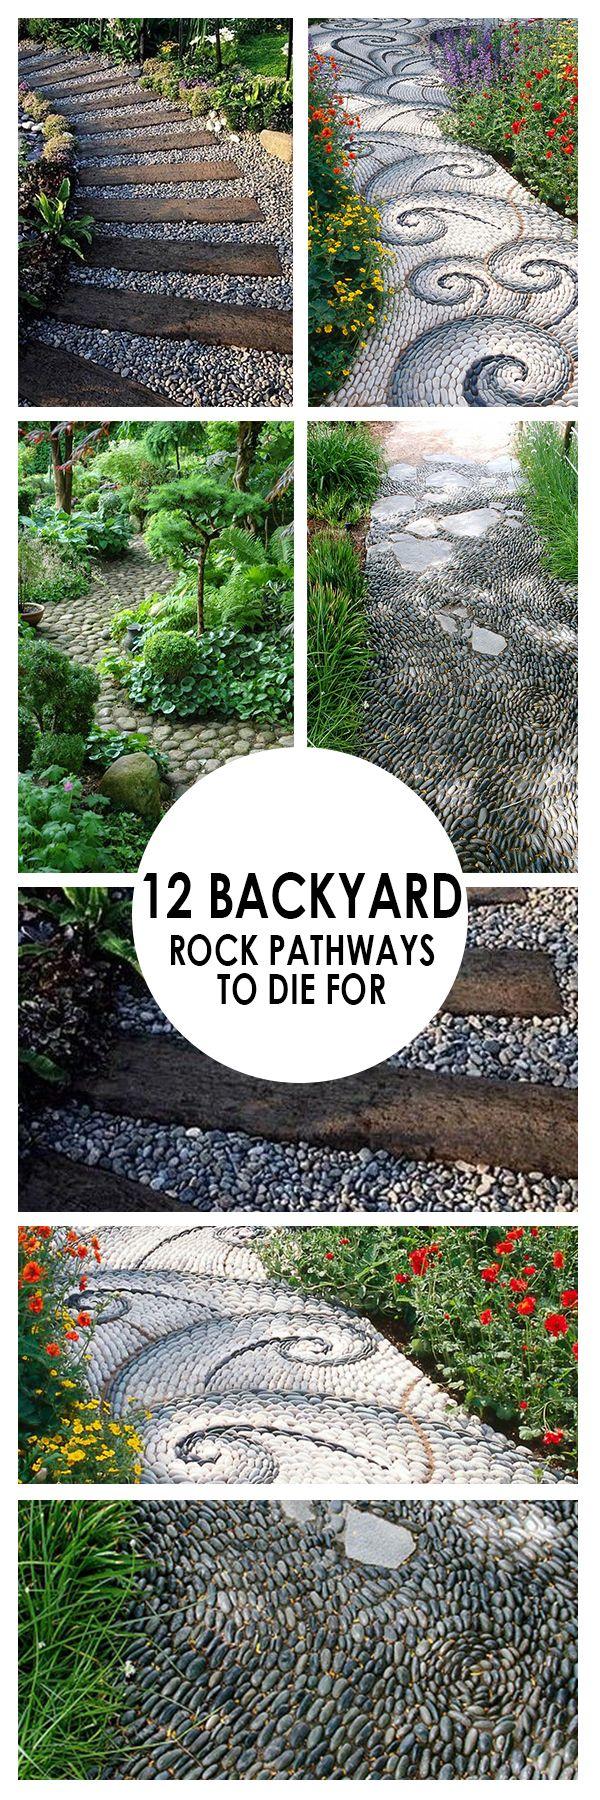 Rock Pathways 12 backyard rock pathways to die for